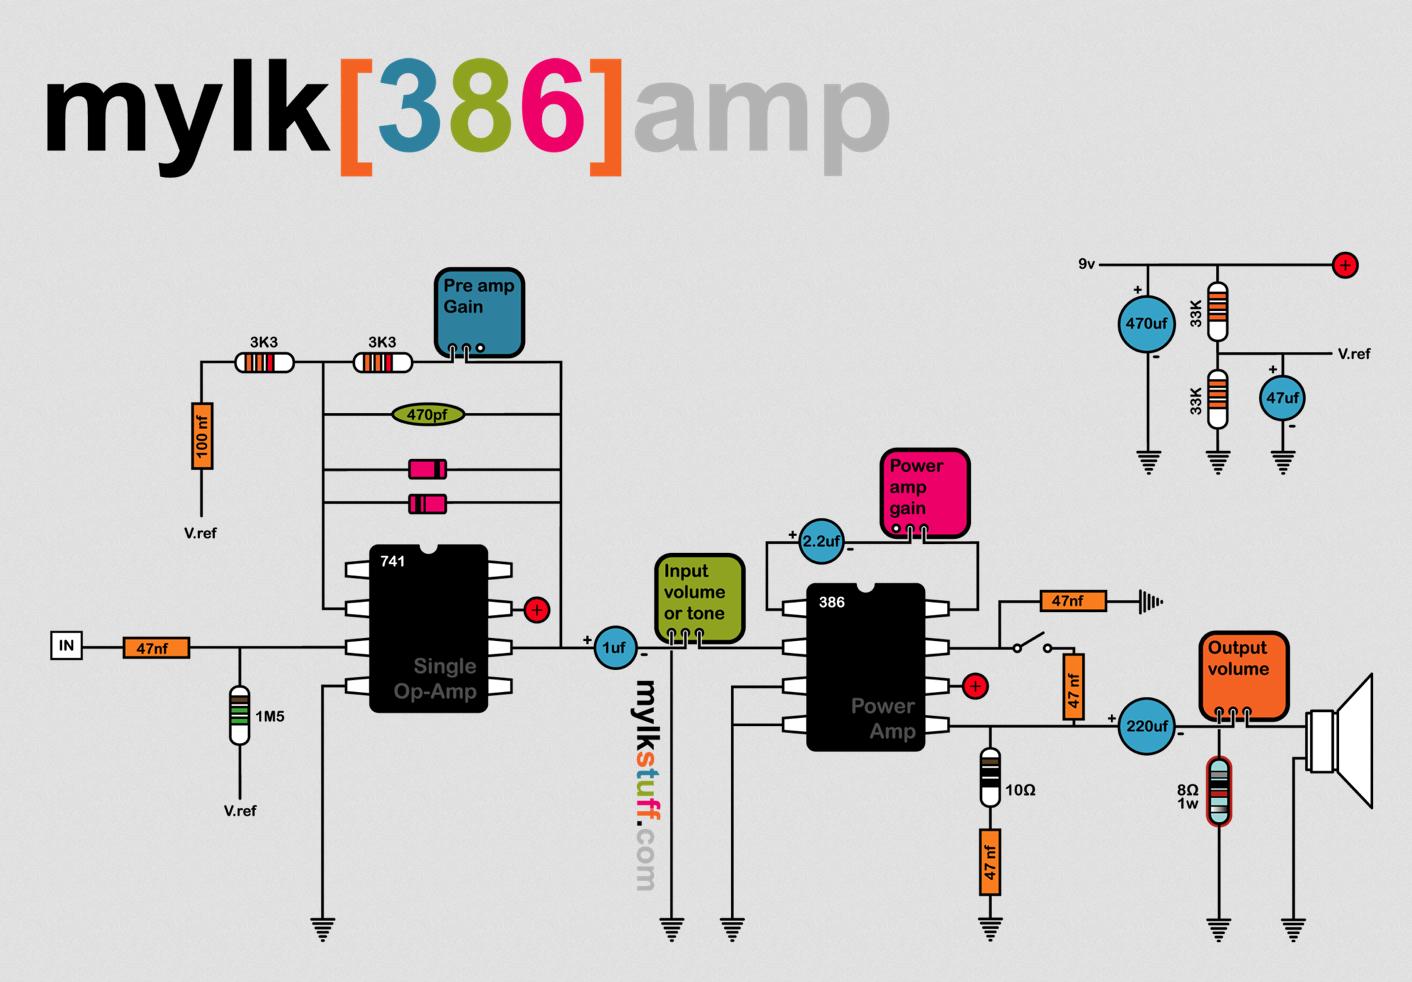 Mylk Blog 386 Amp Project Diys In 2018 Pinterest 723 Voltage Regulators Electronic Circuits And Diagramelectronics